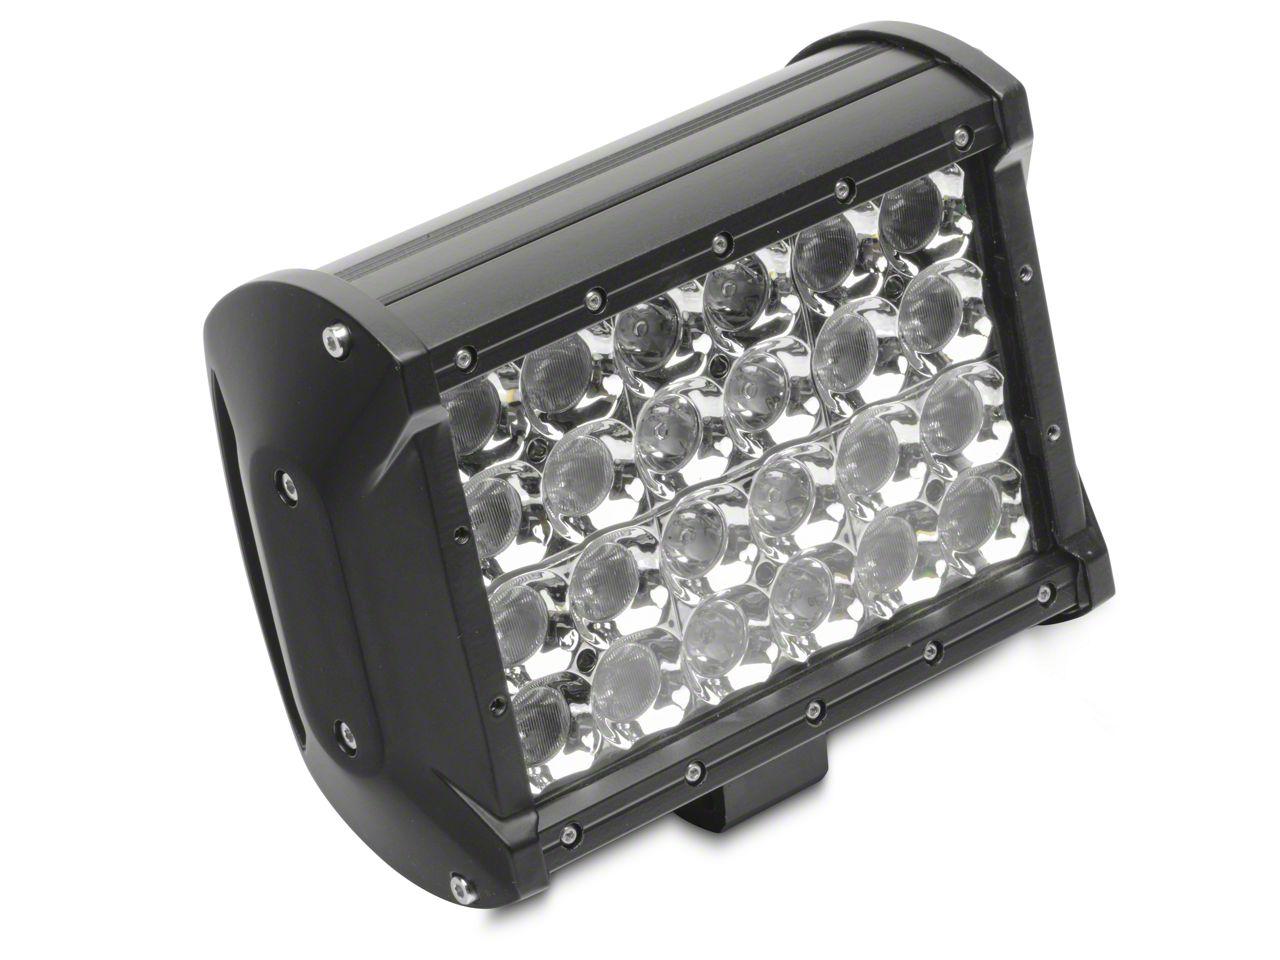 Alteon 7 in. 6 Series LED Light Bar - Flood/Spot Combo